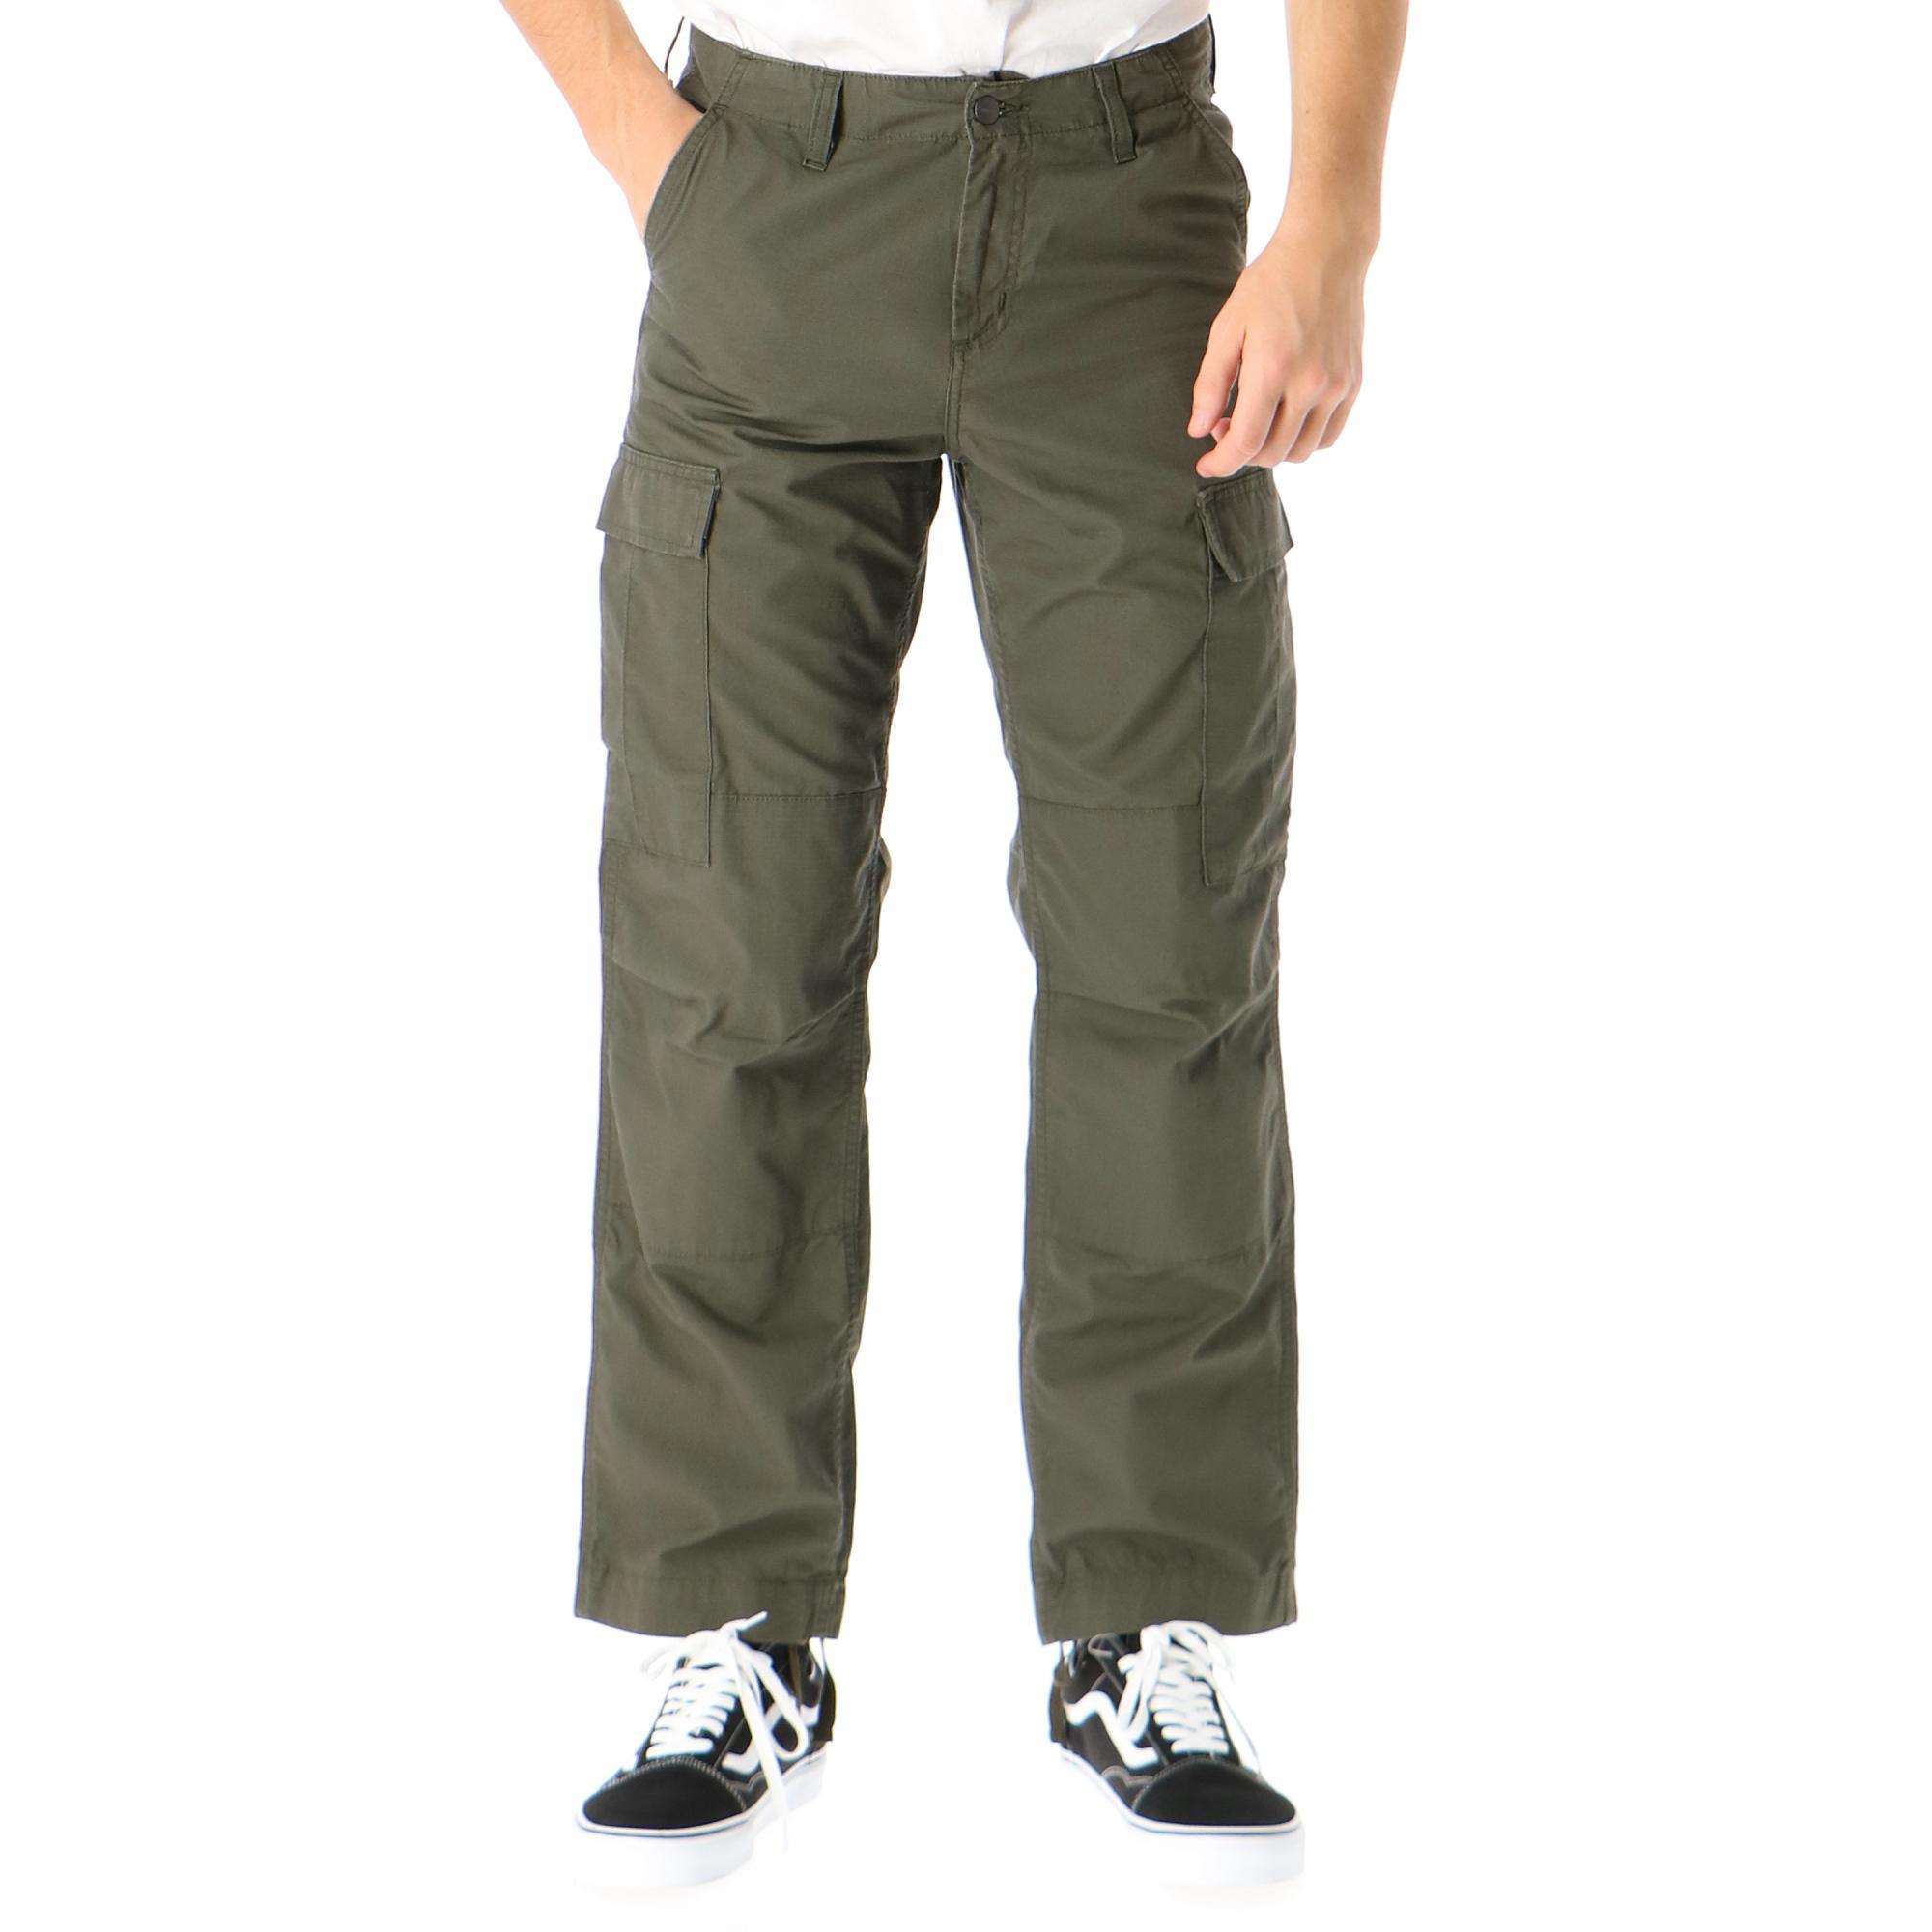 Carhartt Regular Cargo Pant Cypress rinsed